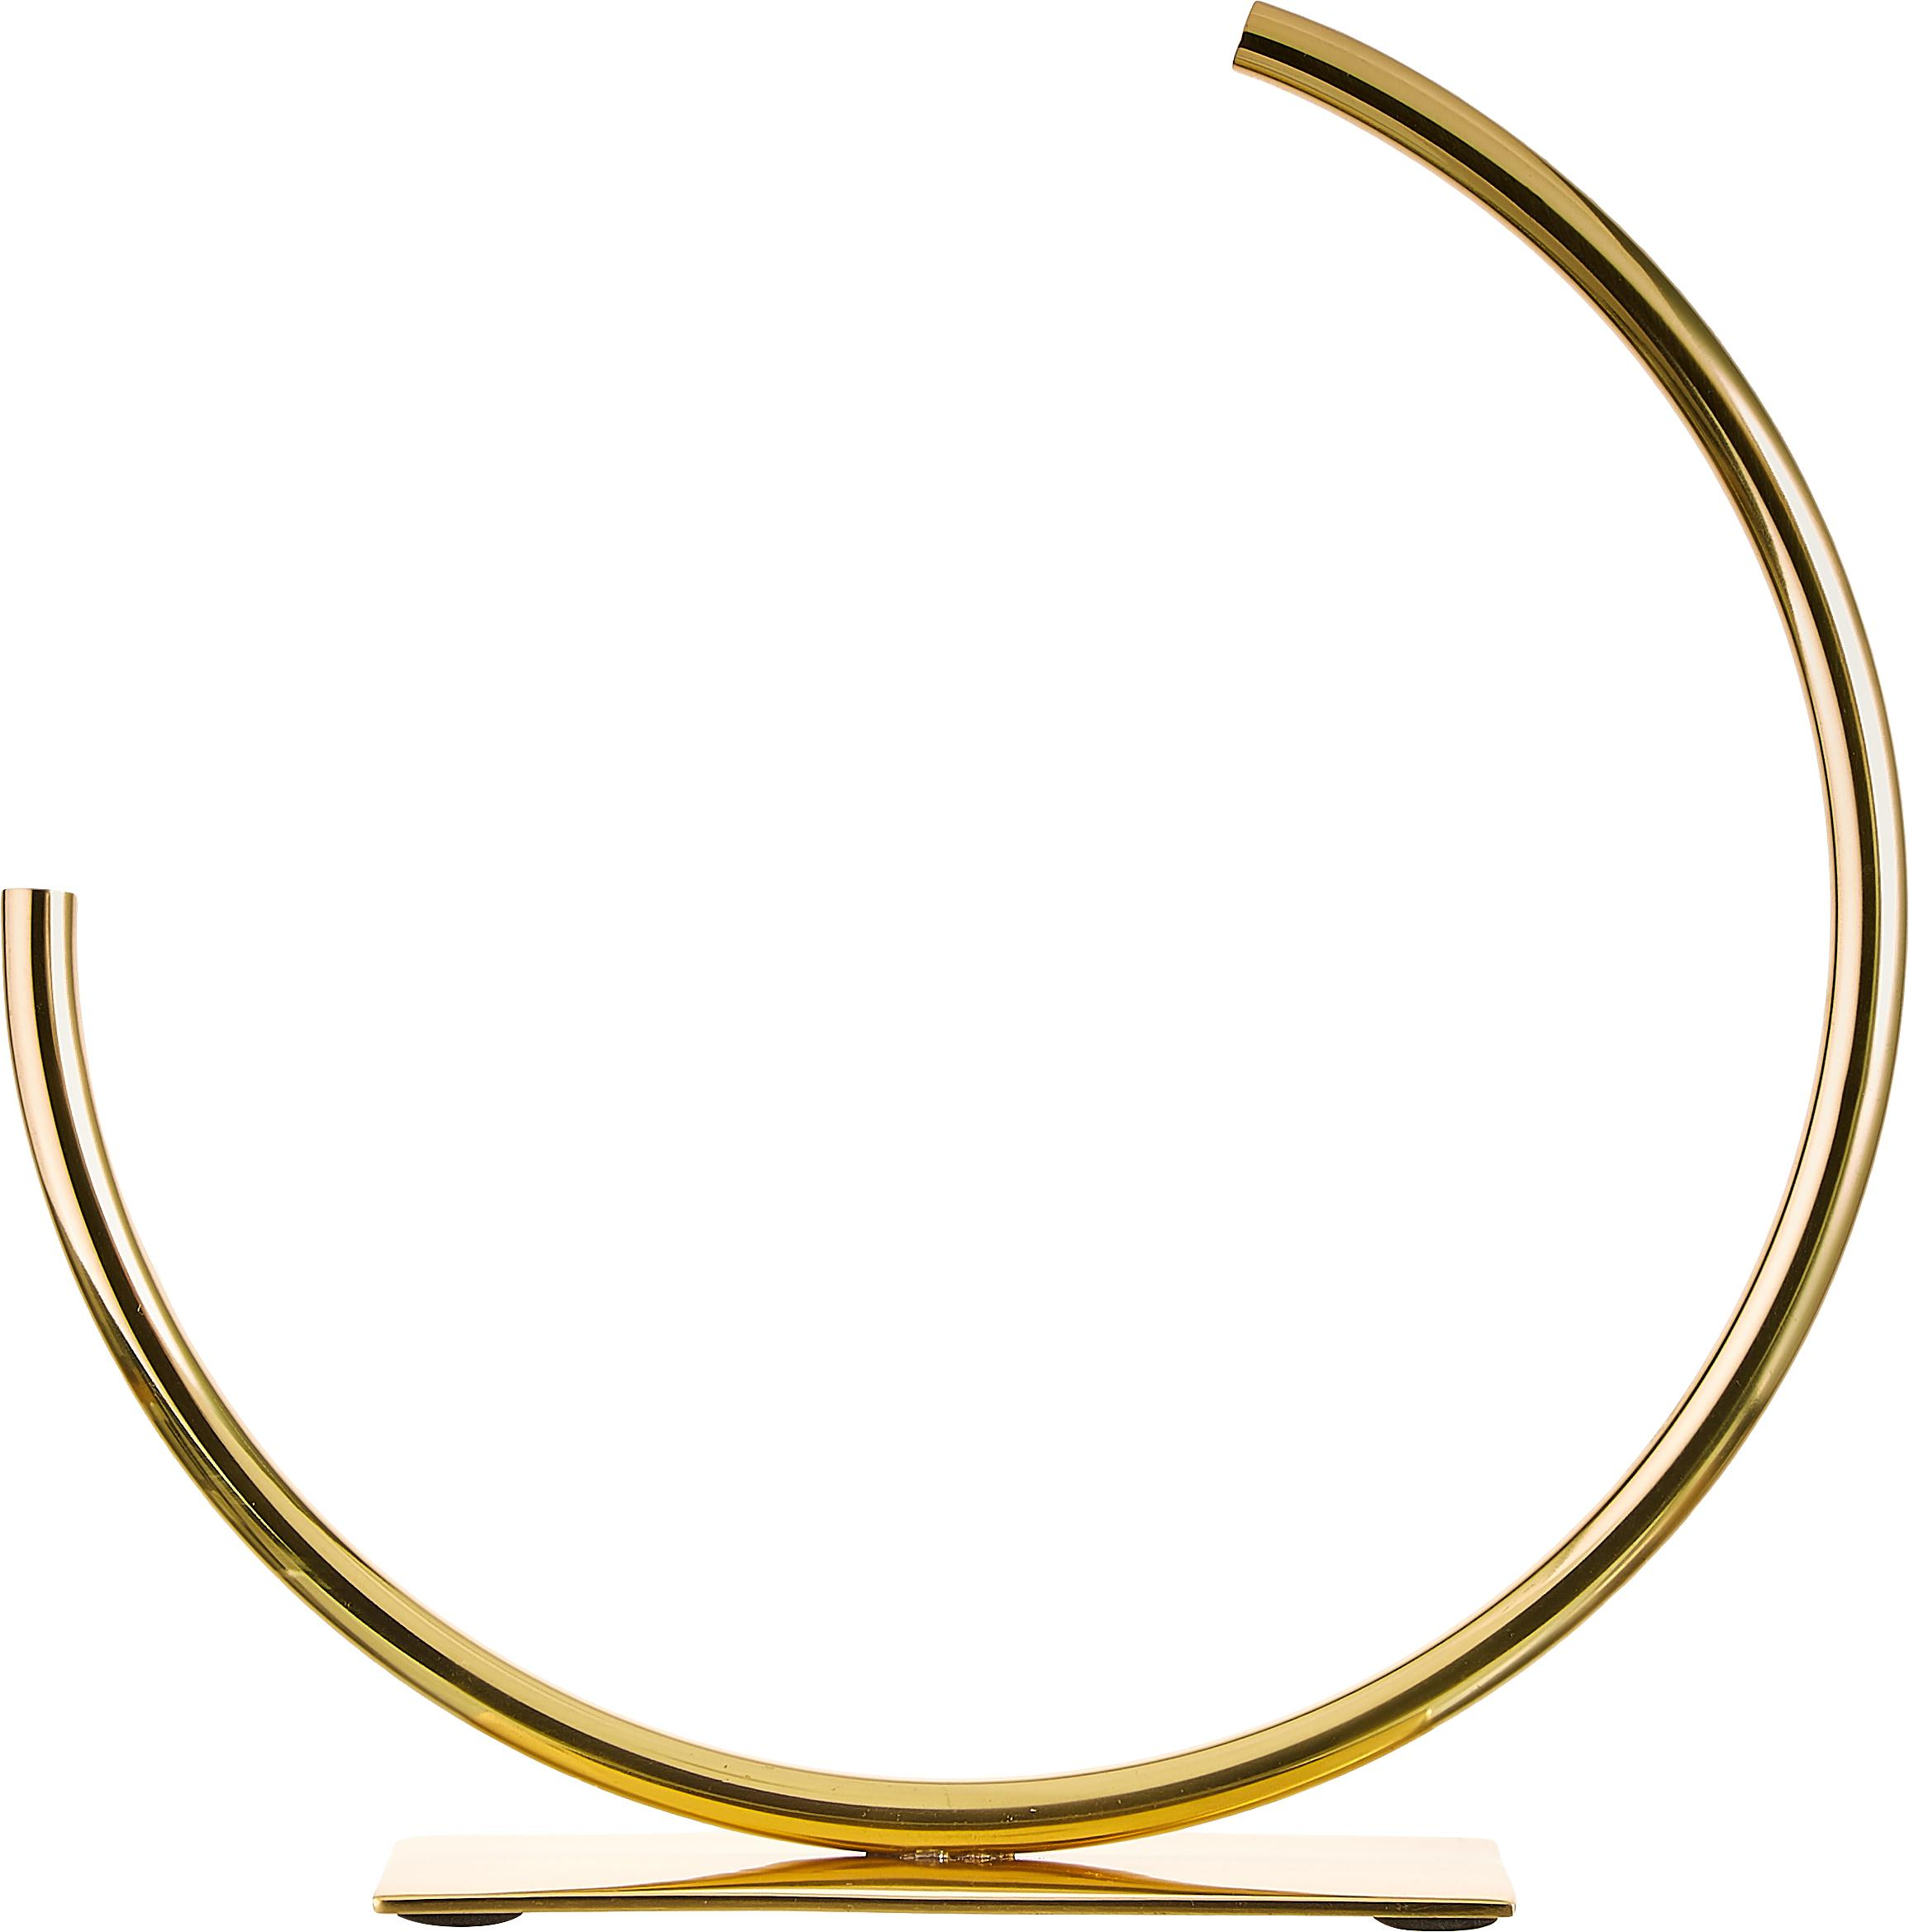 Vaso in metallo in metallo Circle, Metallo, Dorato, Larg. 29 x Alt. 30 cm